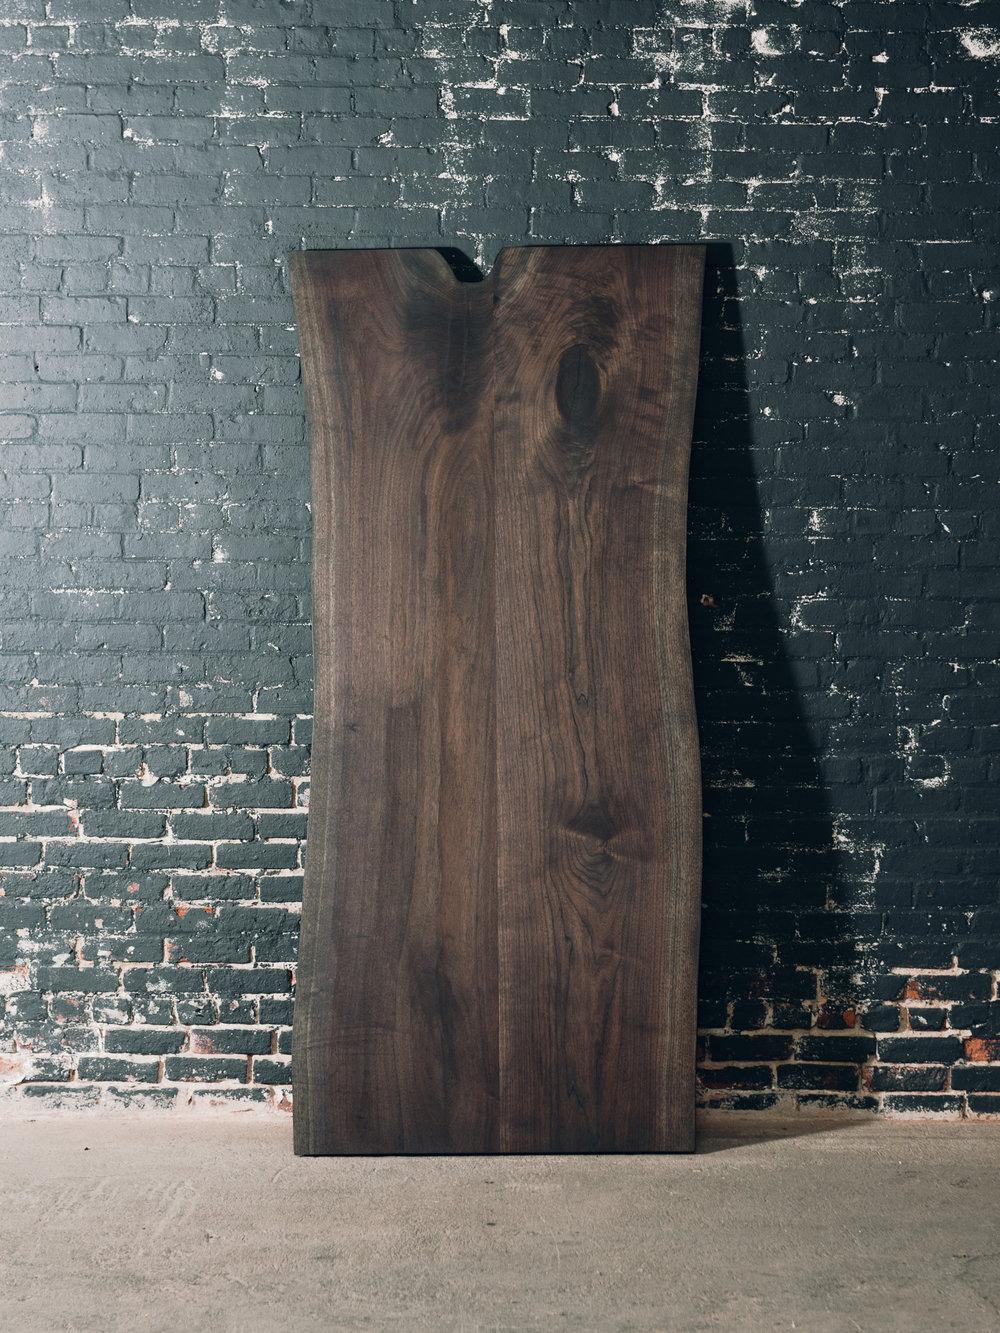 7' x 3' Charcoal Walnut Slab Table (Sold)